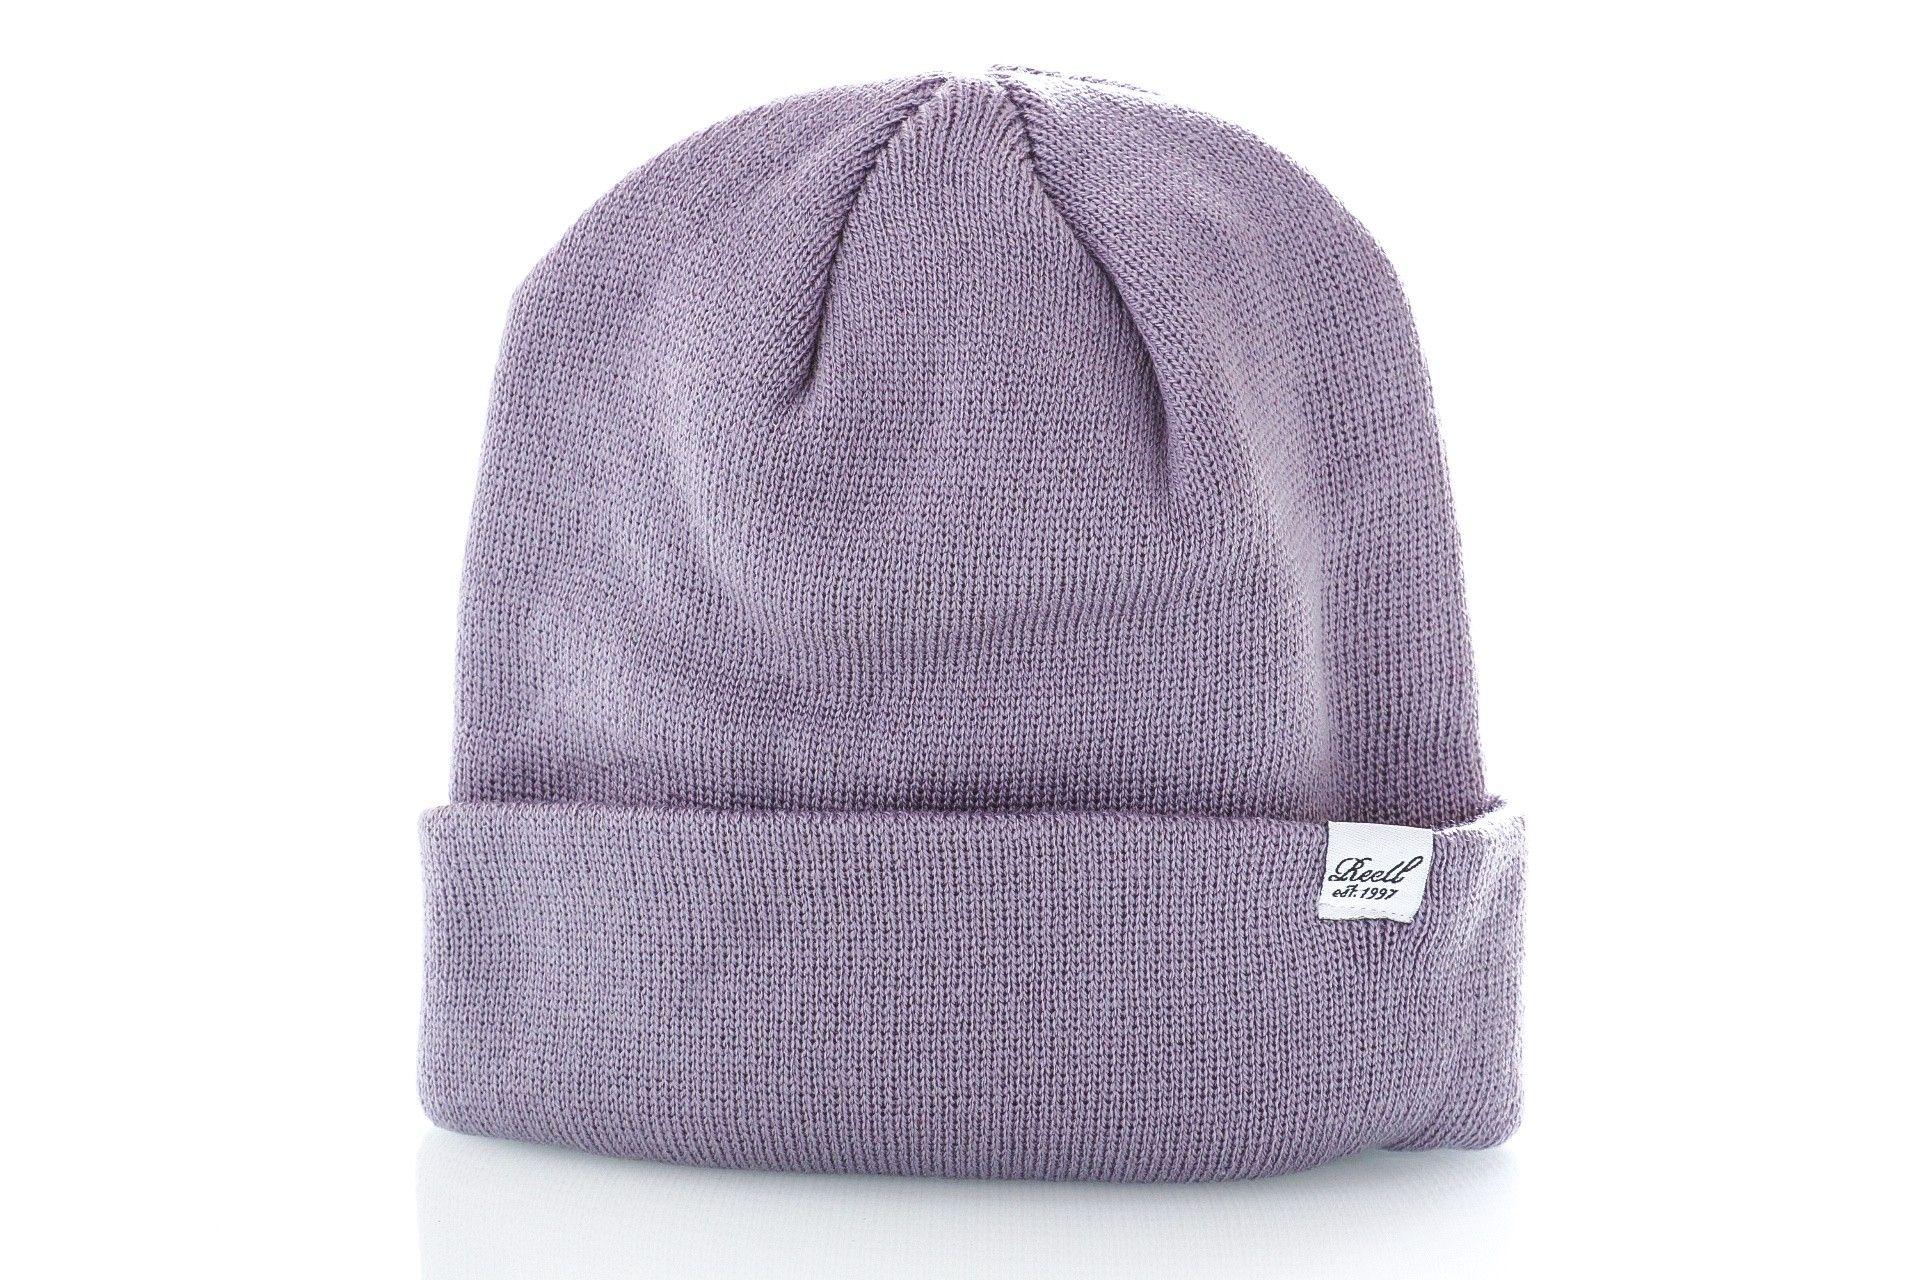 Afbeelding van Reell Muts Beanie Light Purple 1404-001